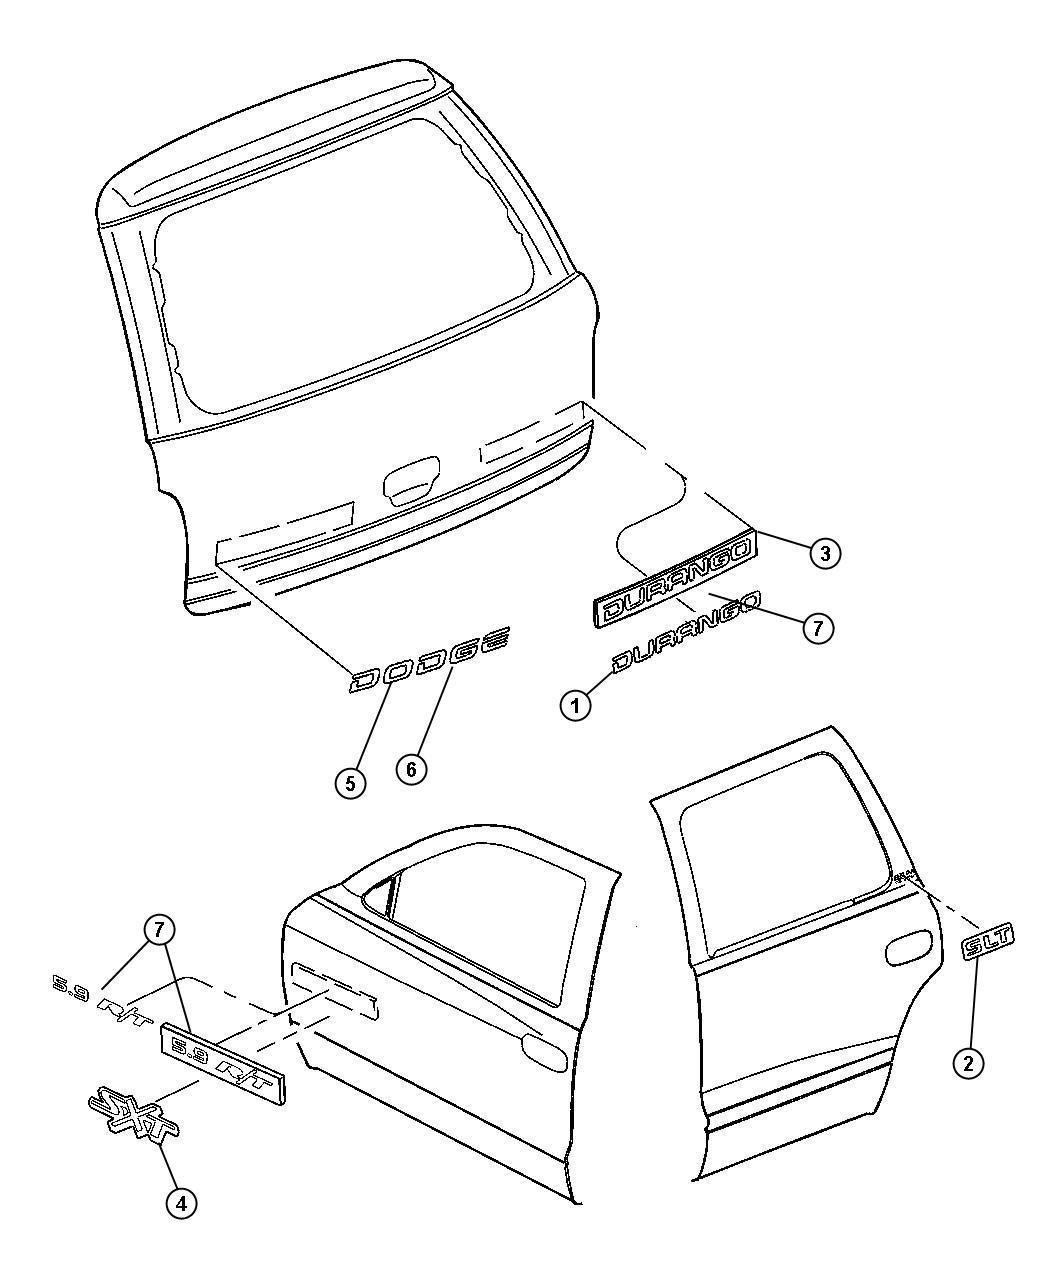 00i57339 2006 pontiac g6 fuse box trucks wiring diagram,2006 Isuzu I 10 Fuse Box